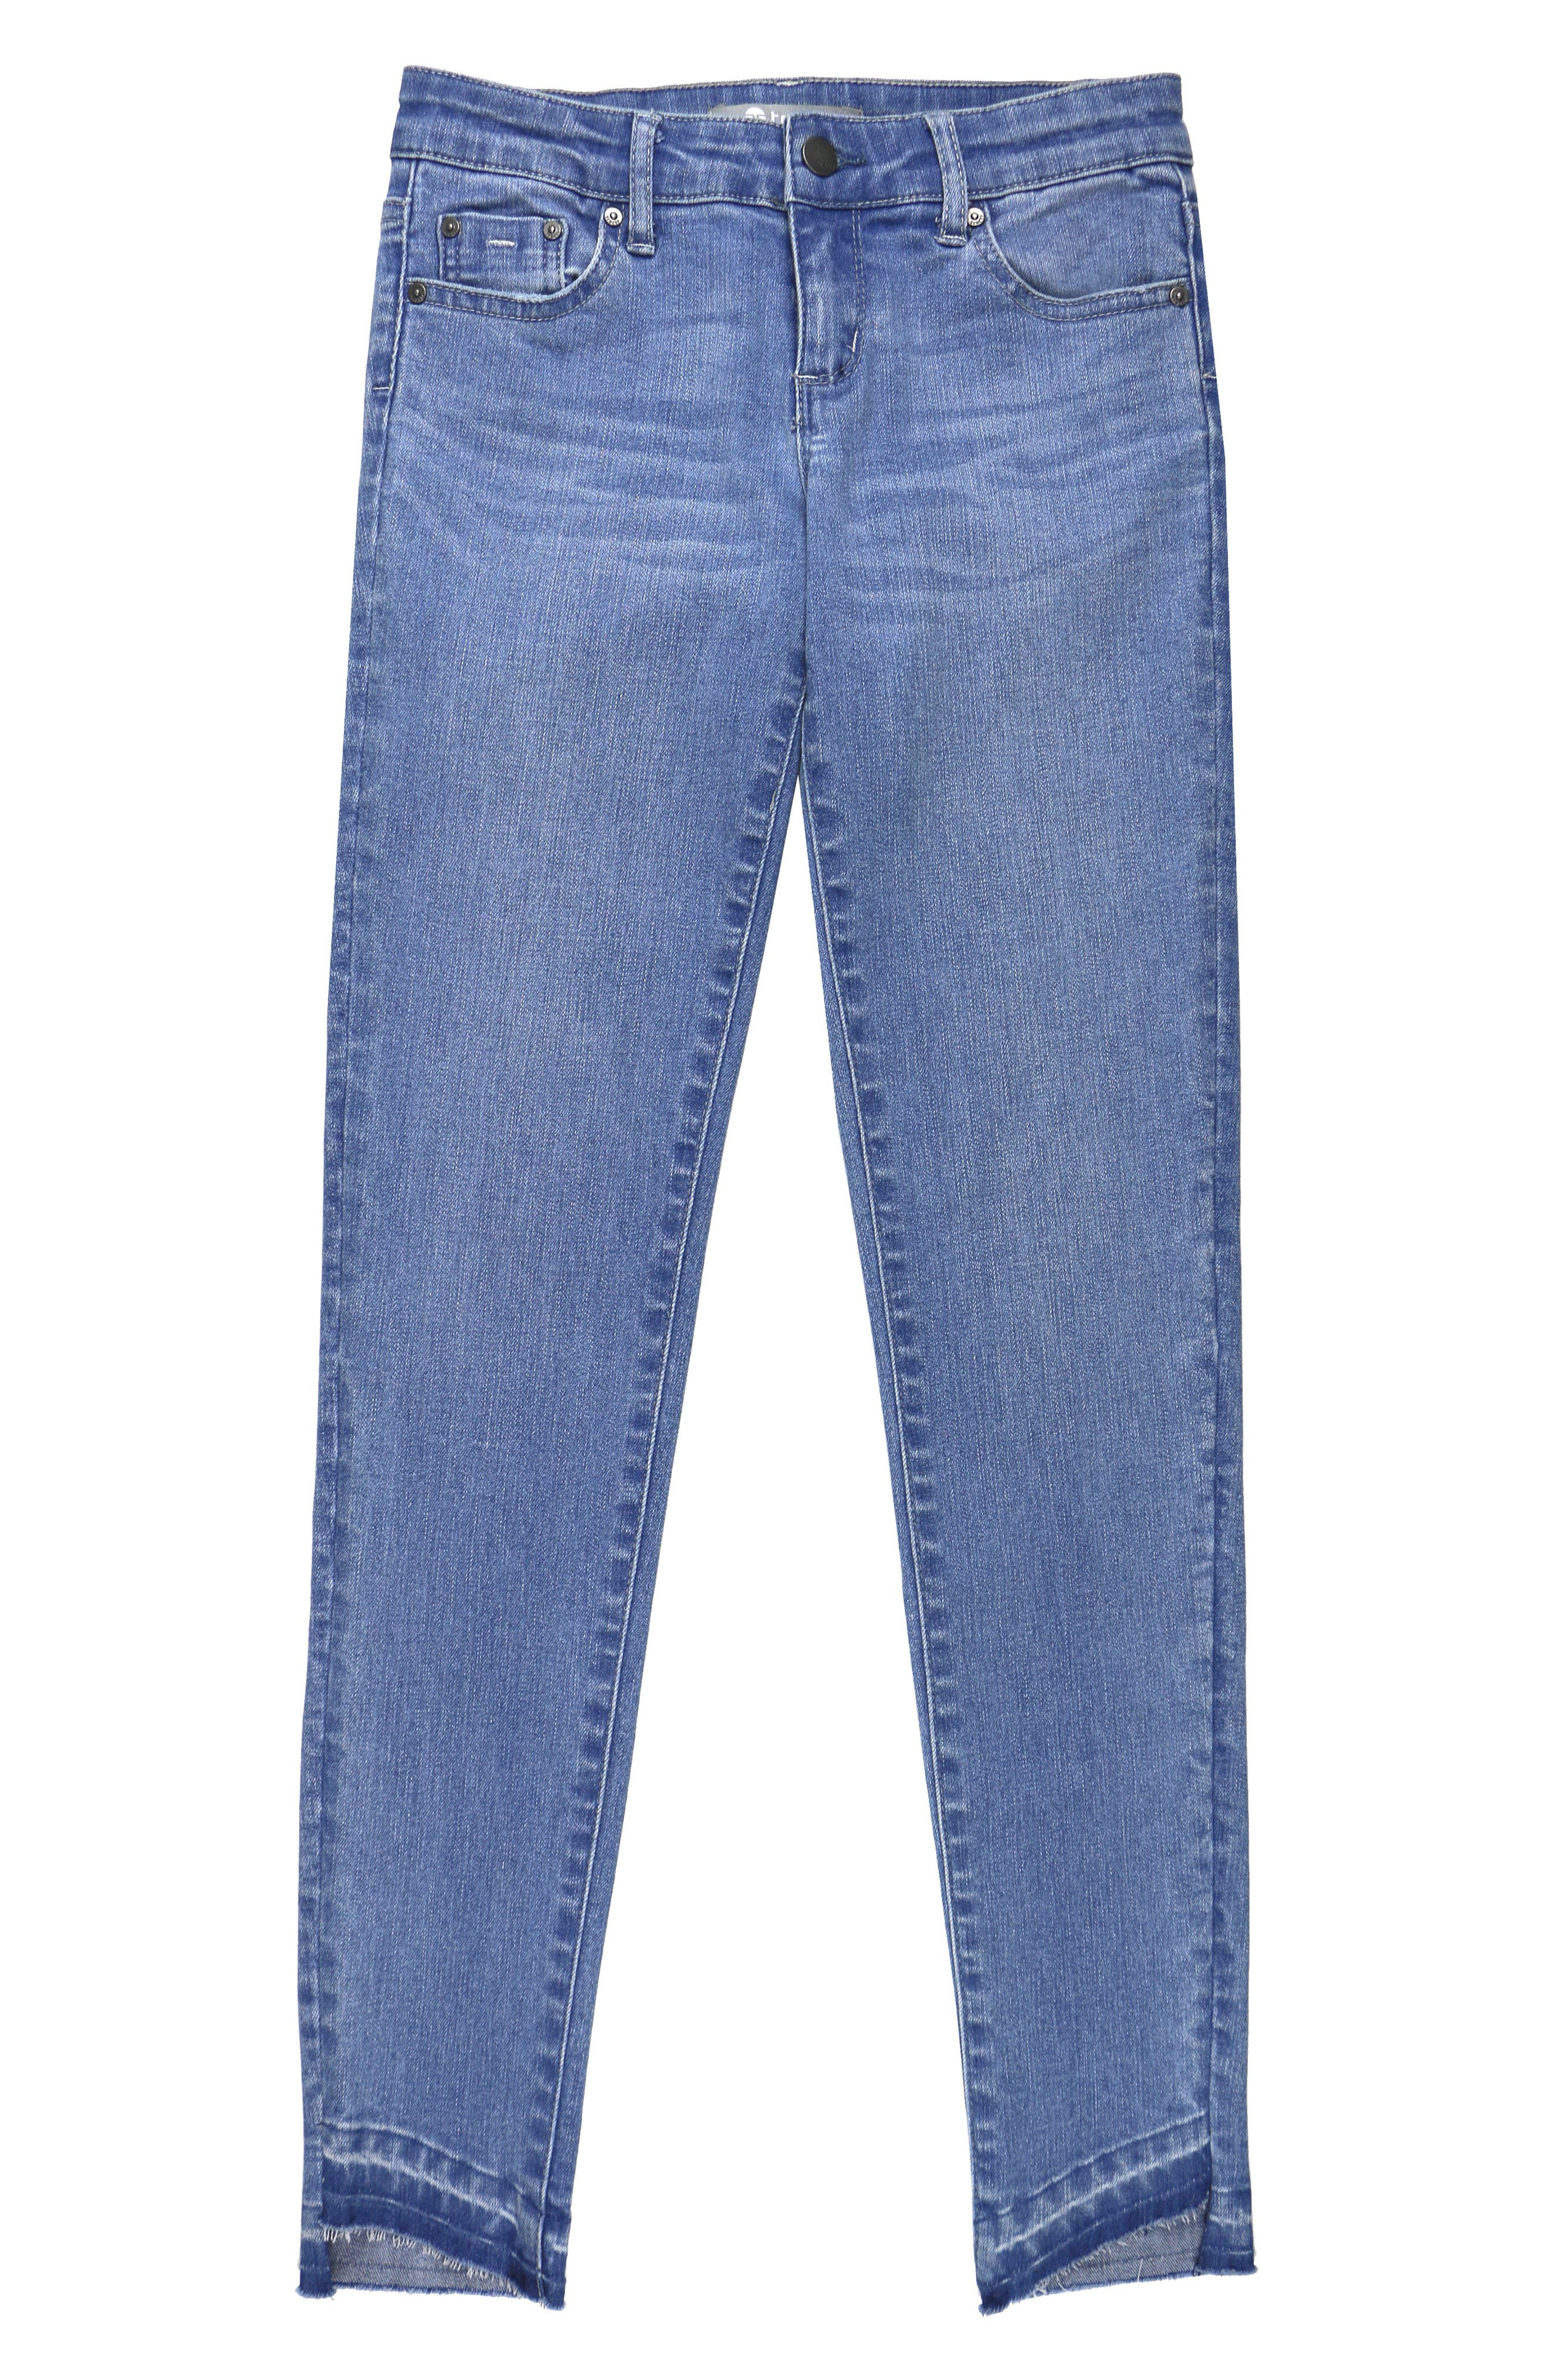 Main Image - Tractr Release Hem Skinny Jeans (Big Girls)